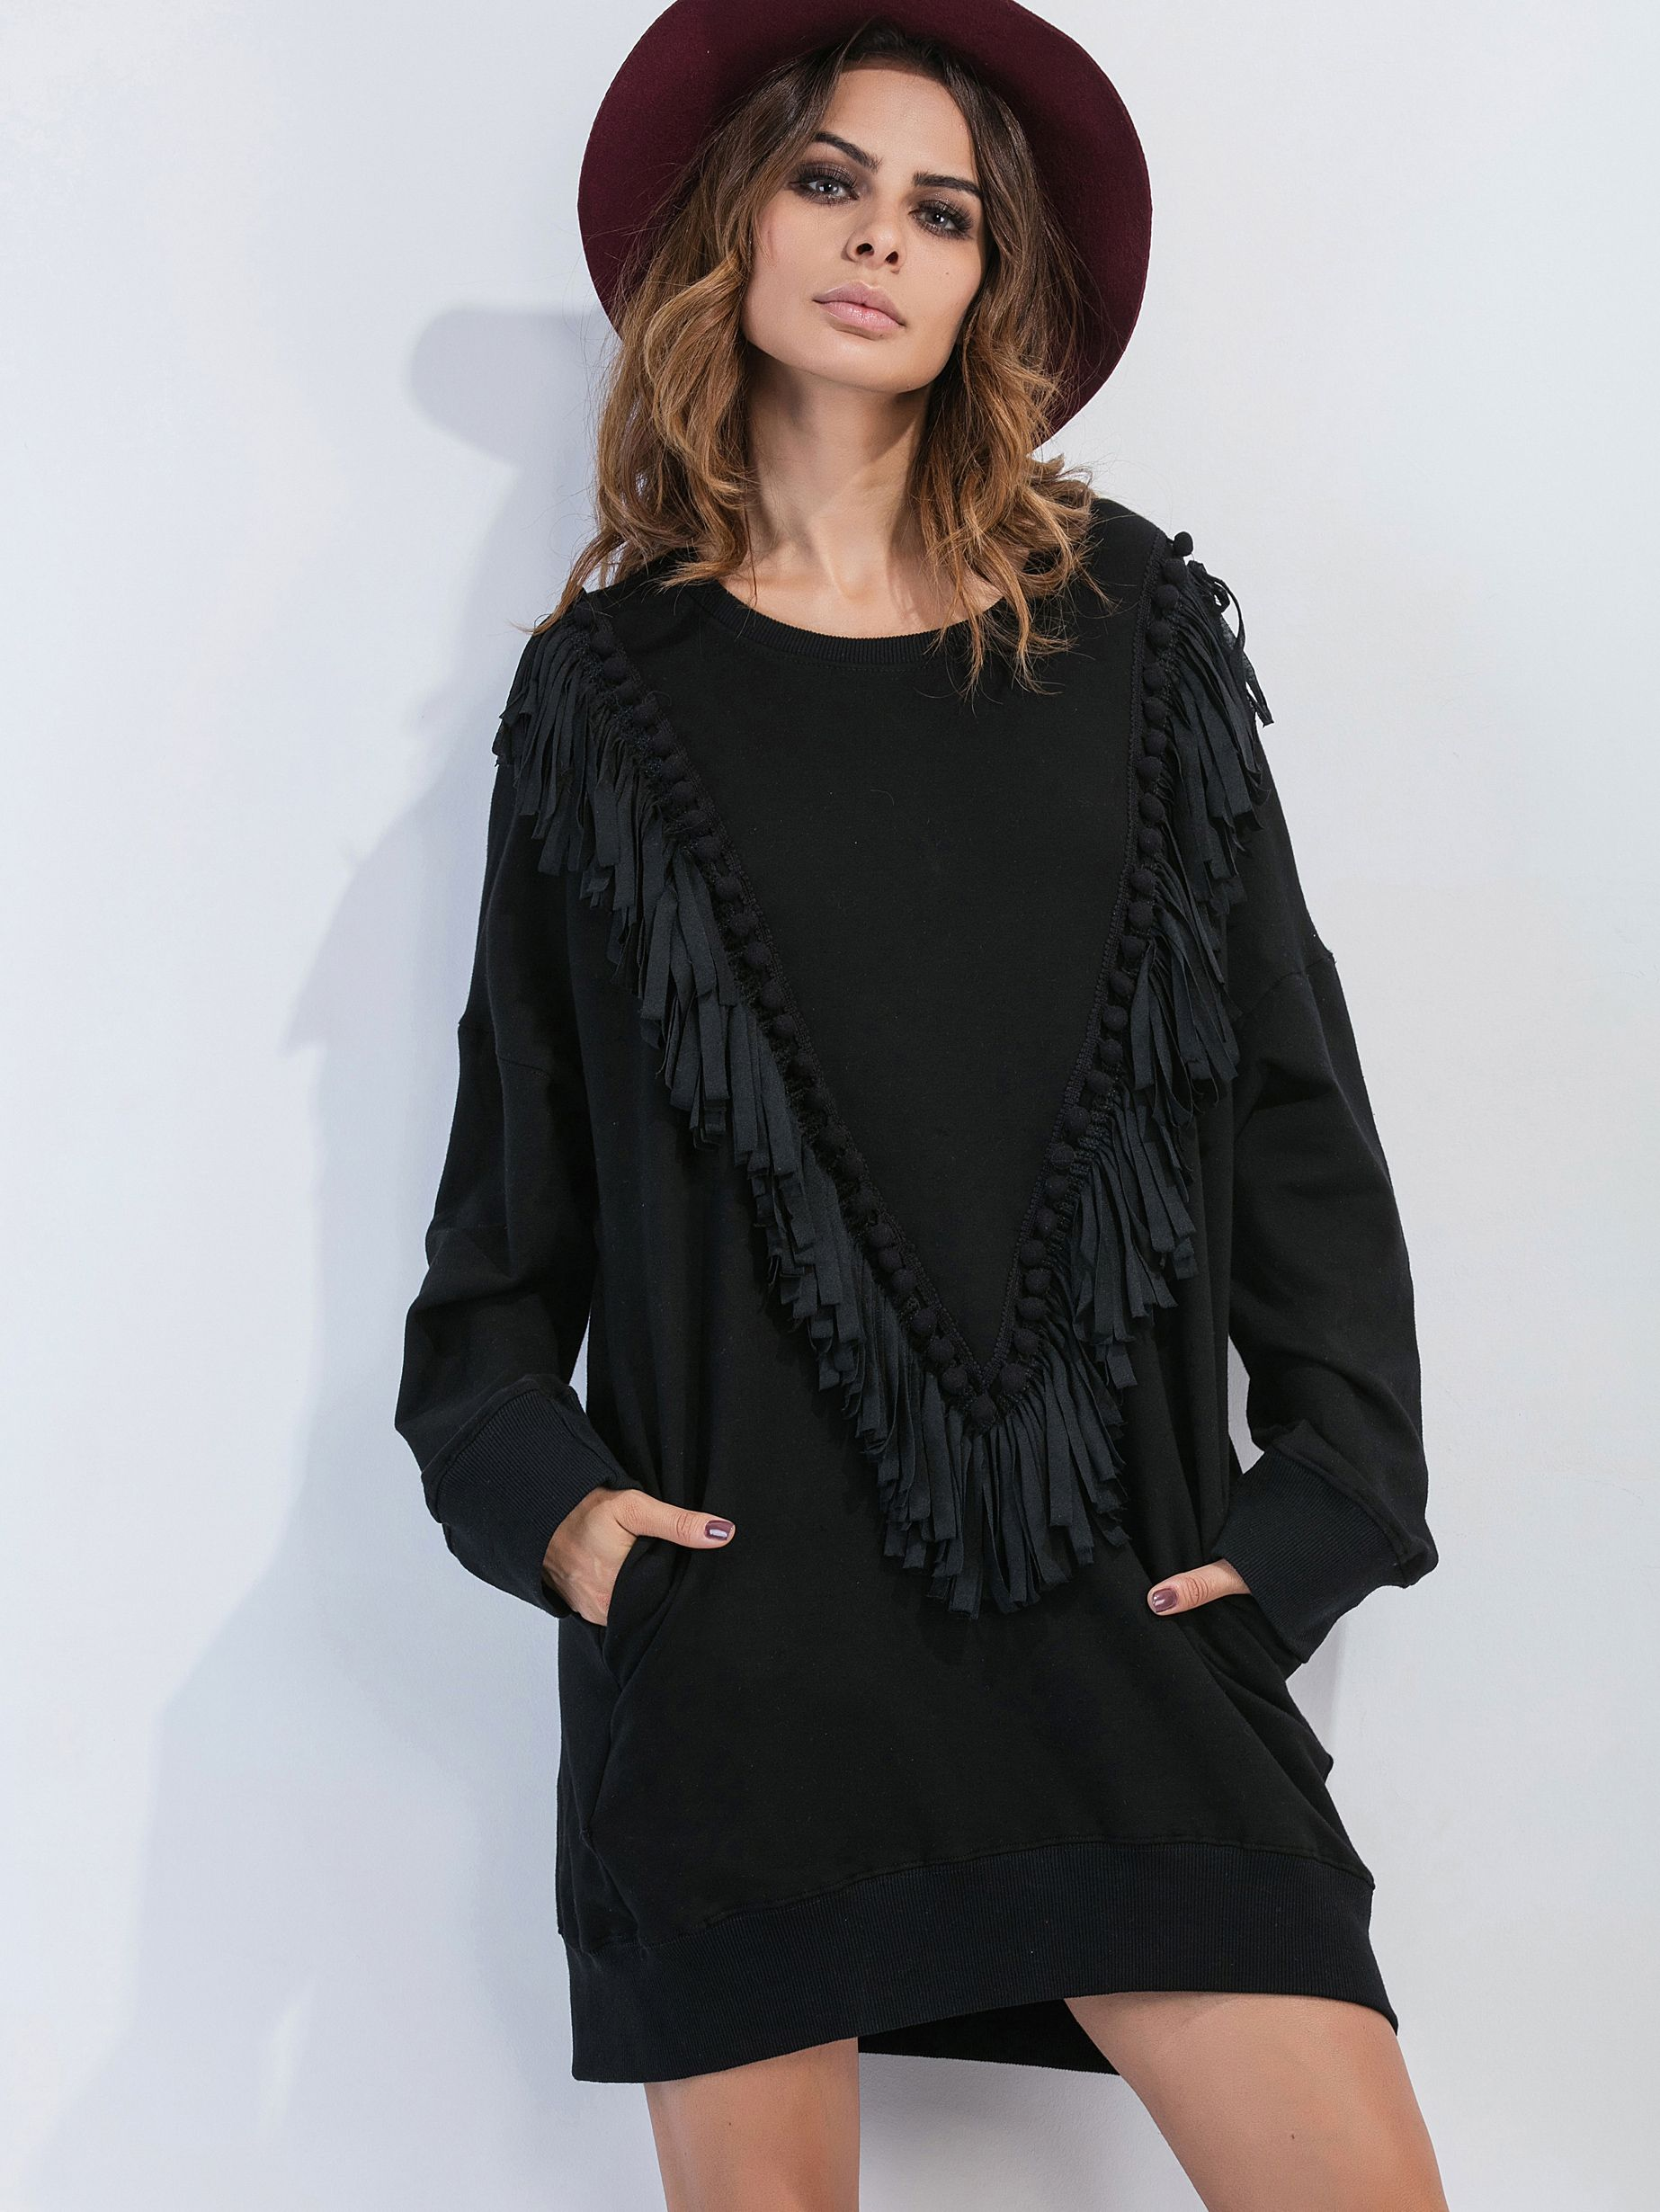 Vestido negro hombro caido